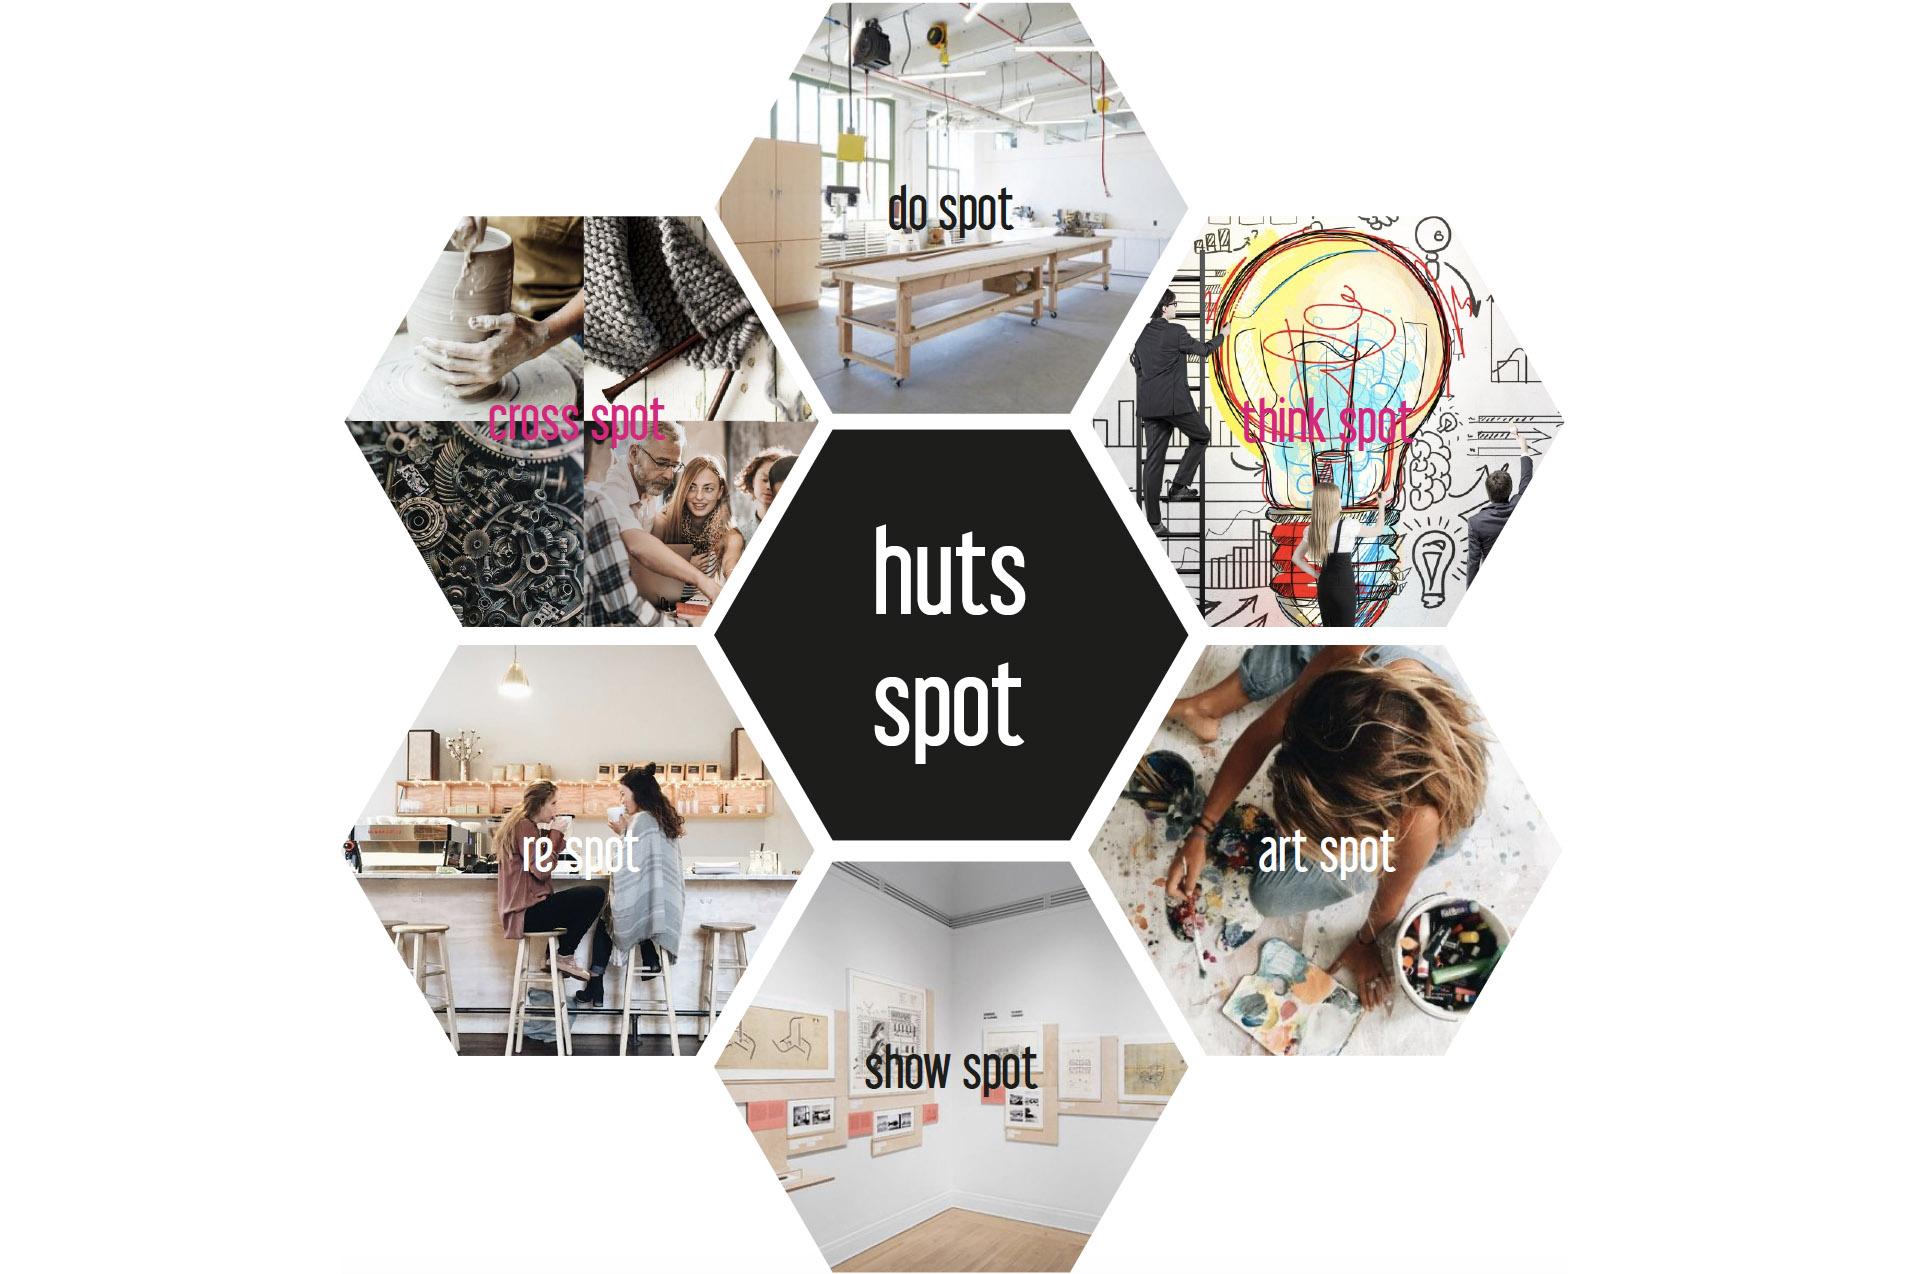 hutsspotweb.jpg